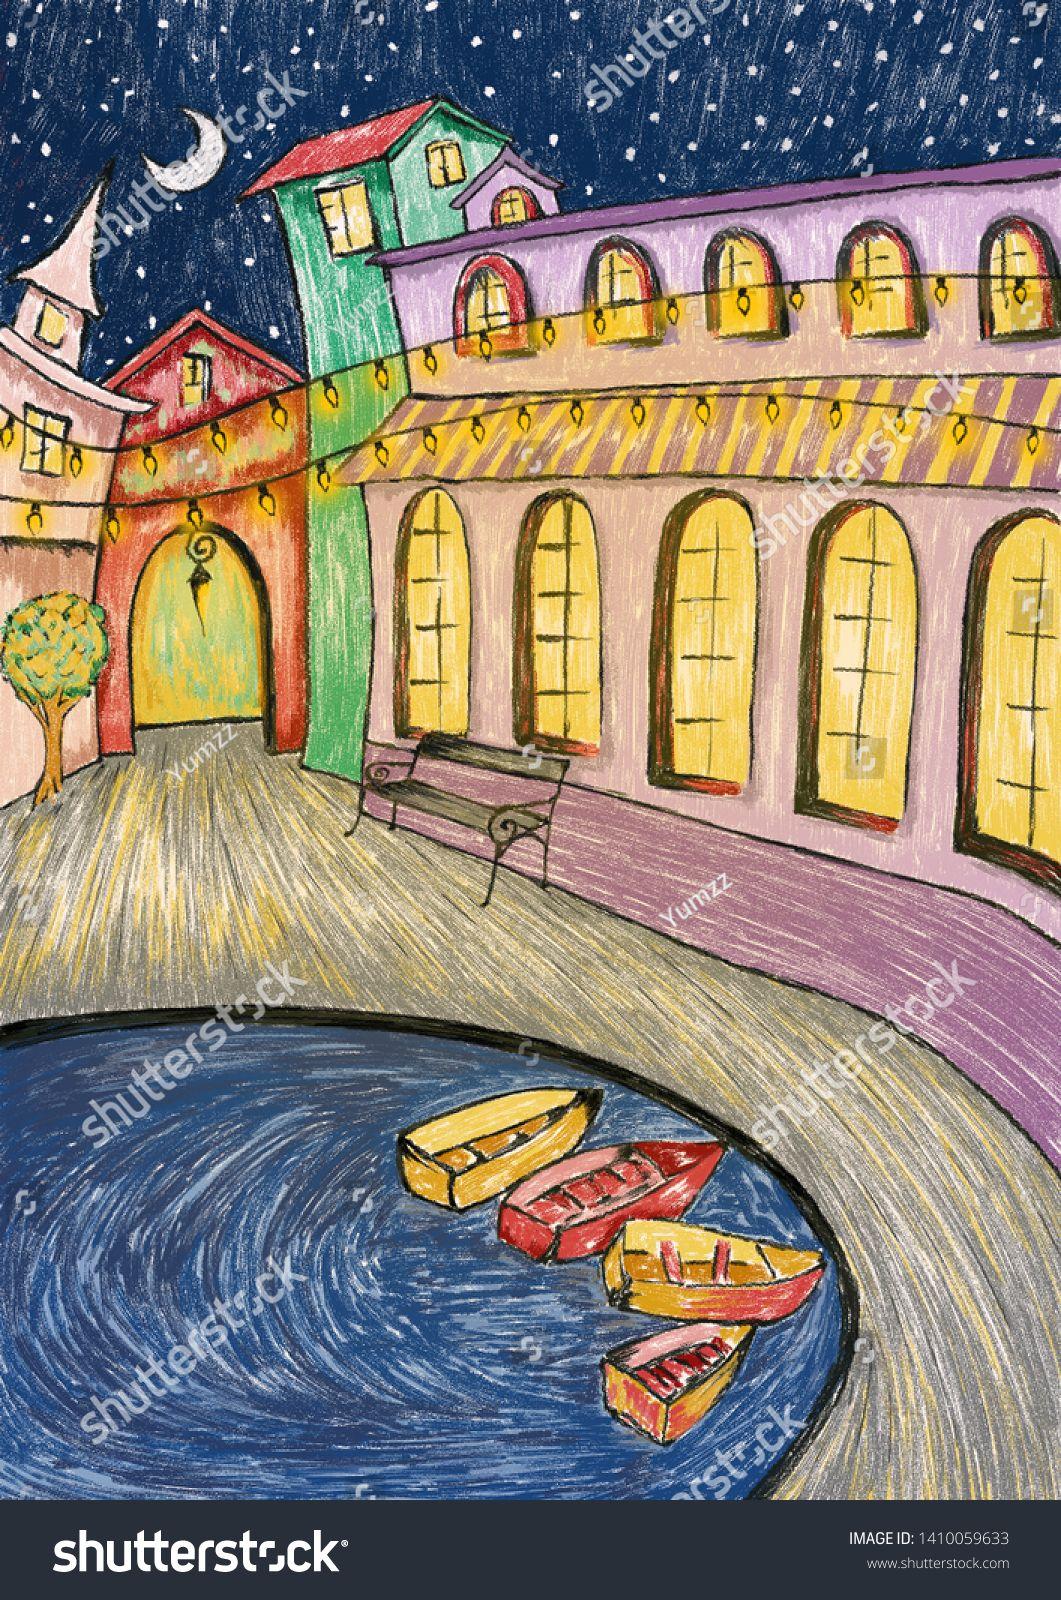 pursue play, kids art, illustration, colorful art work, digital art #Ad , #ad, #kids#art#pursue#play